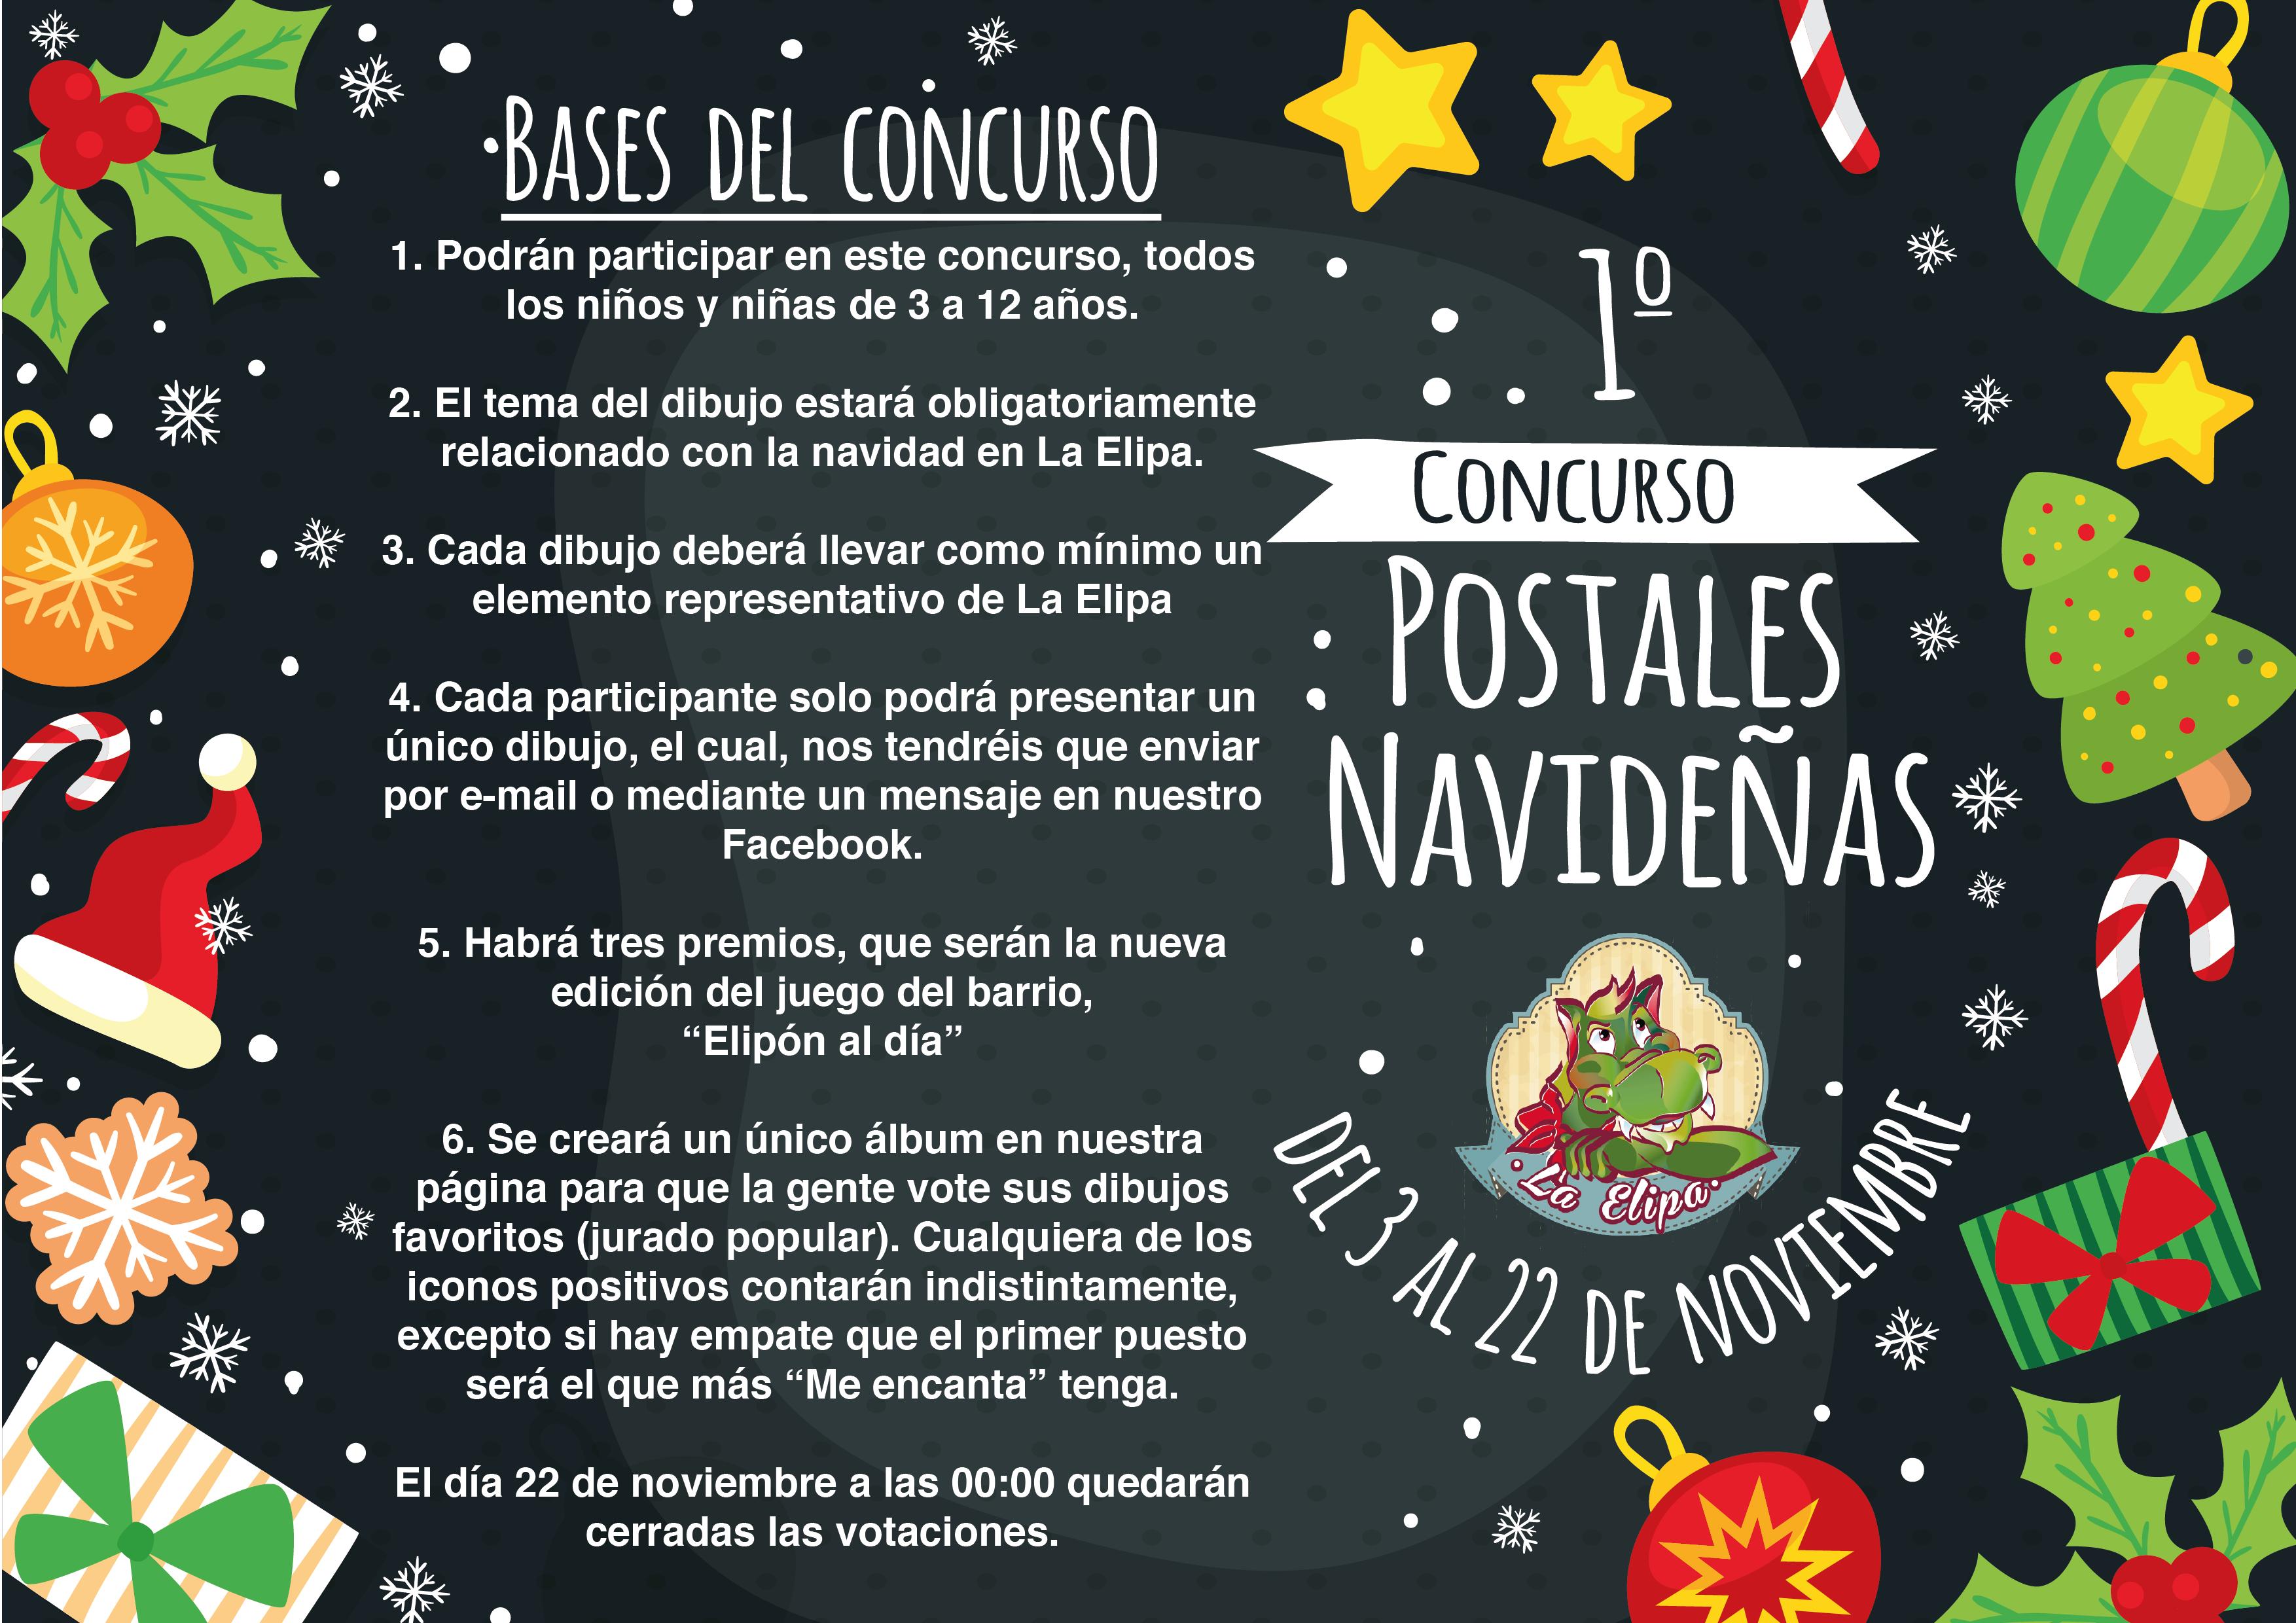 Primer Concurso de Postales Navideas  LA ELIPA SI QUE FLIPA